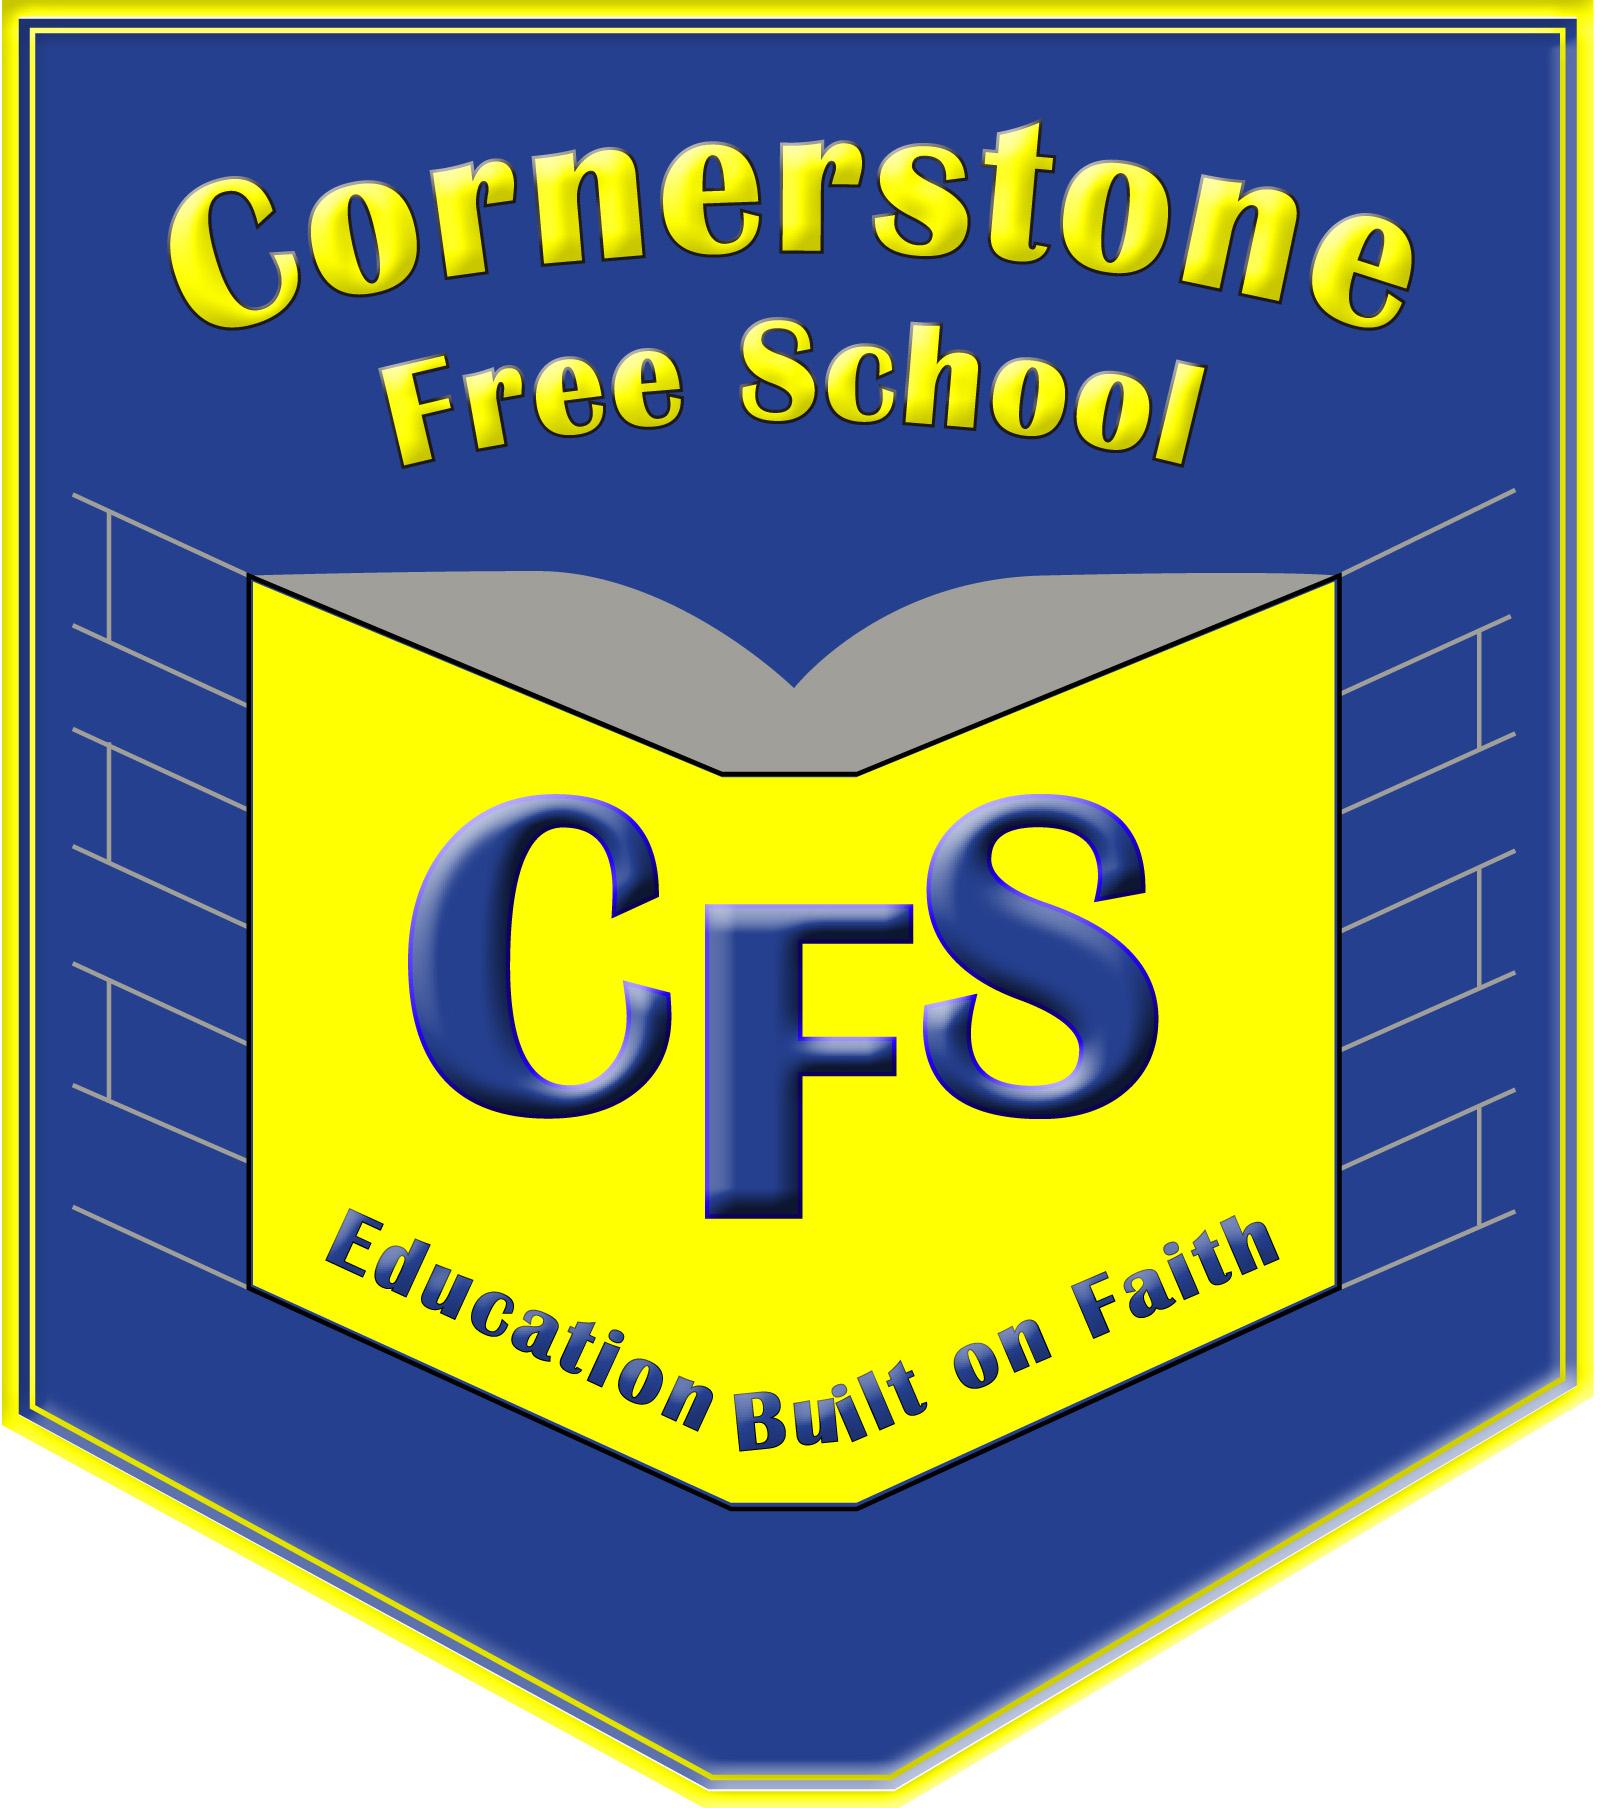 Cornerstone Free School